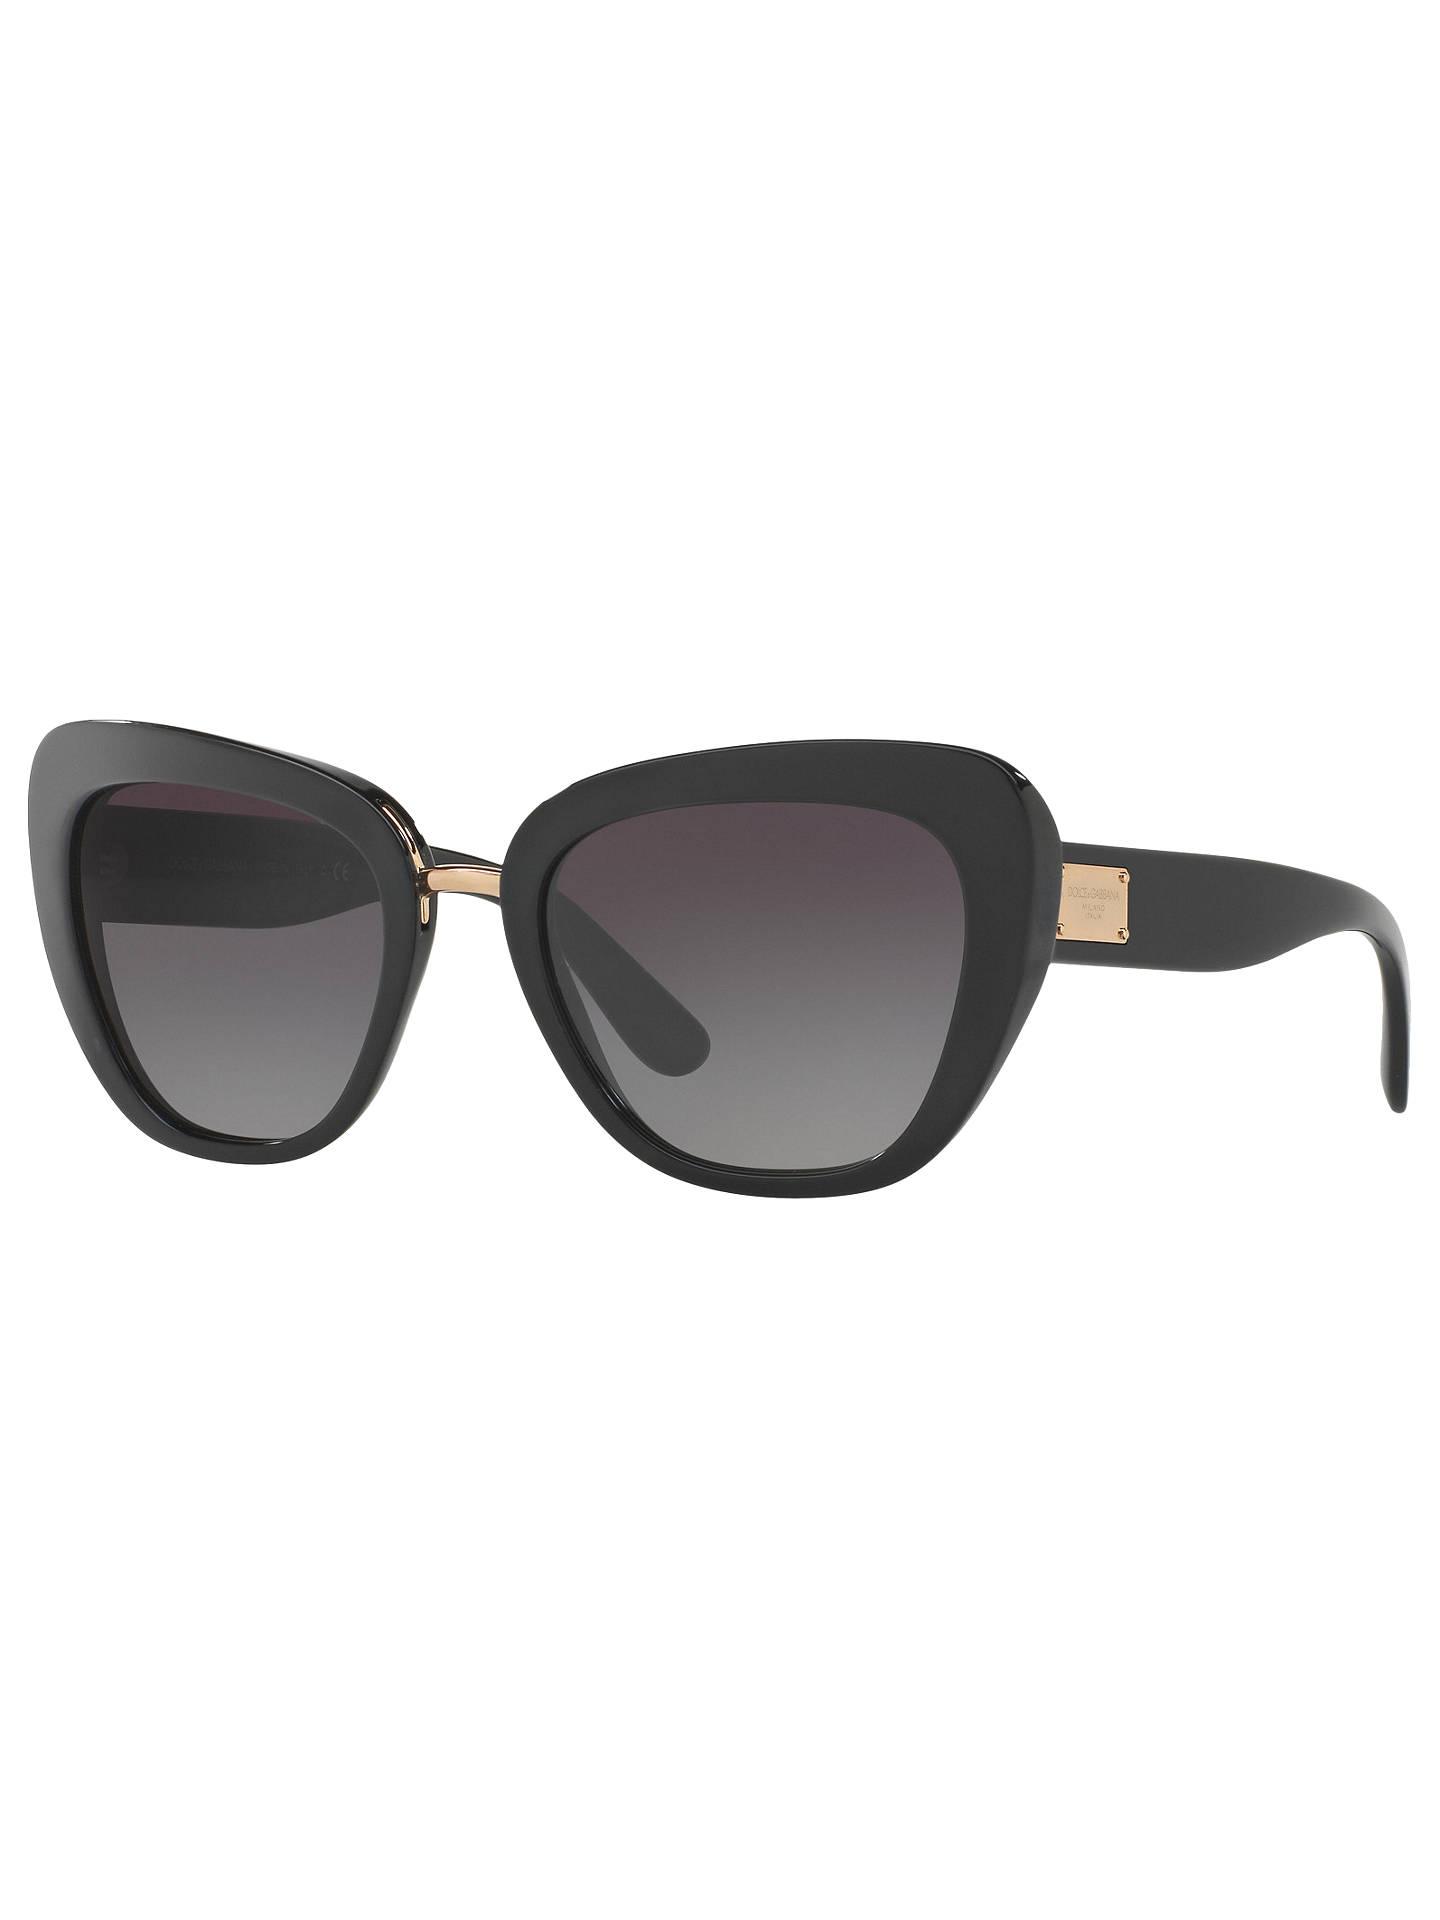 a7c365f1d64a Buy Dolce & Gabbana DG4296 Cat's Eye Sunglasses, Black/Grey Gradient Online  at johnlewis ...